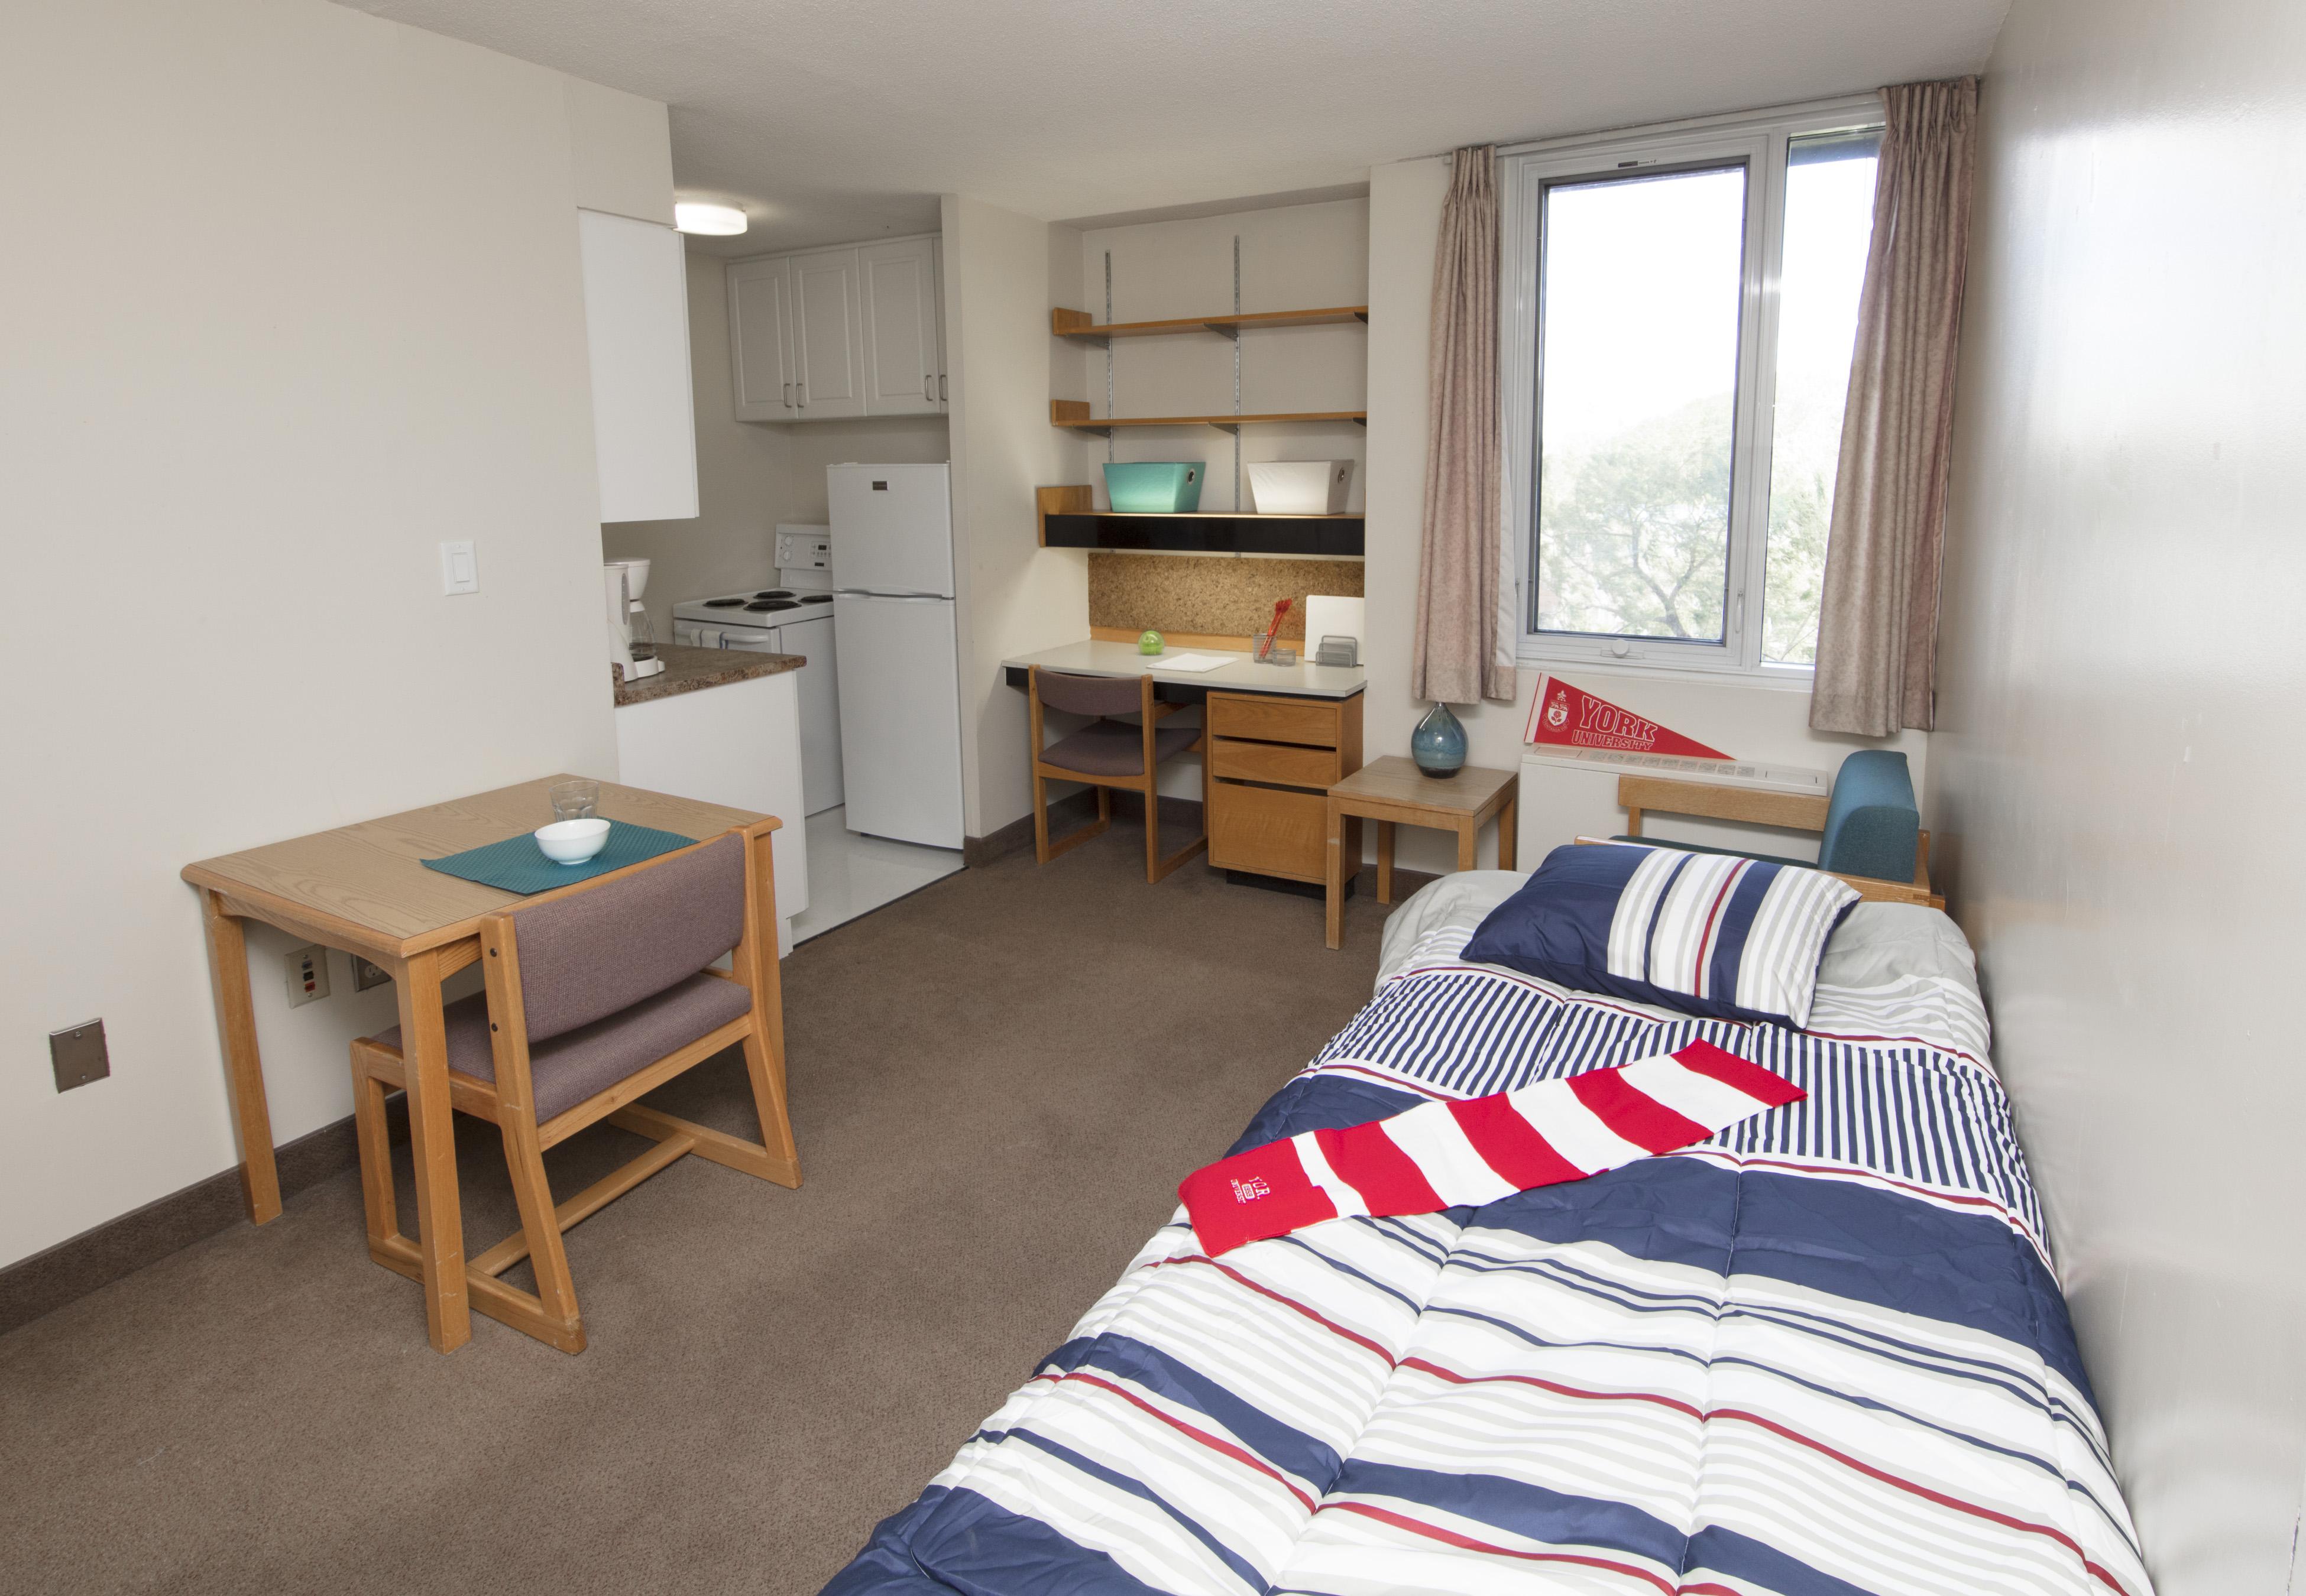 image of bachelor apartment